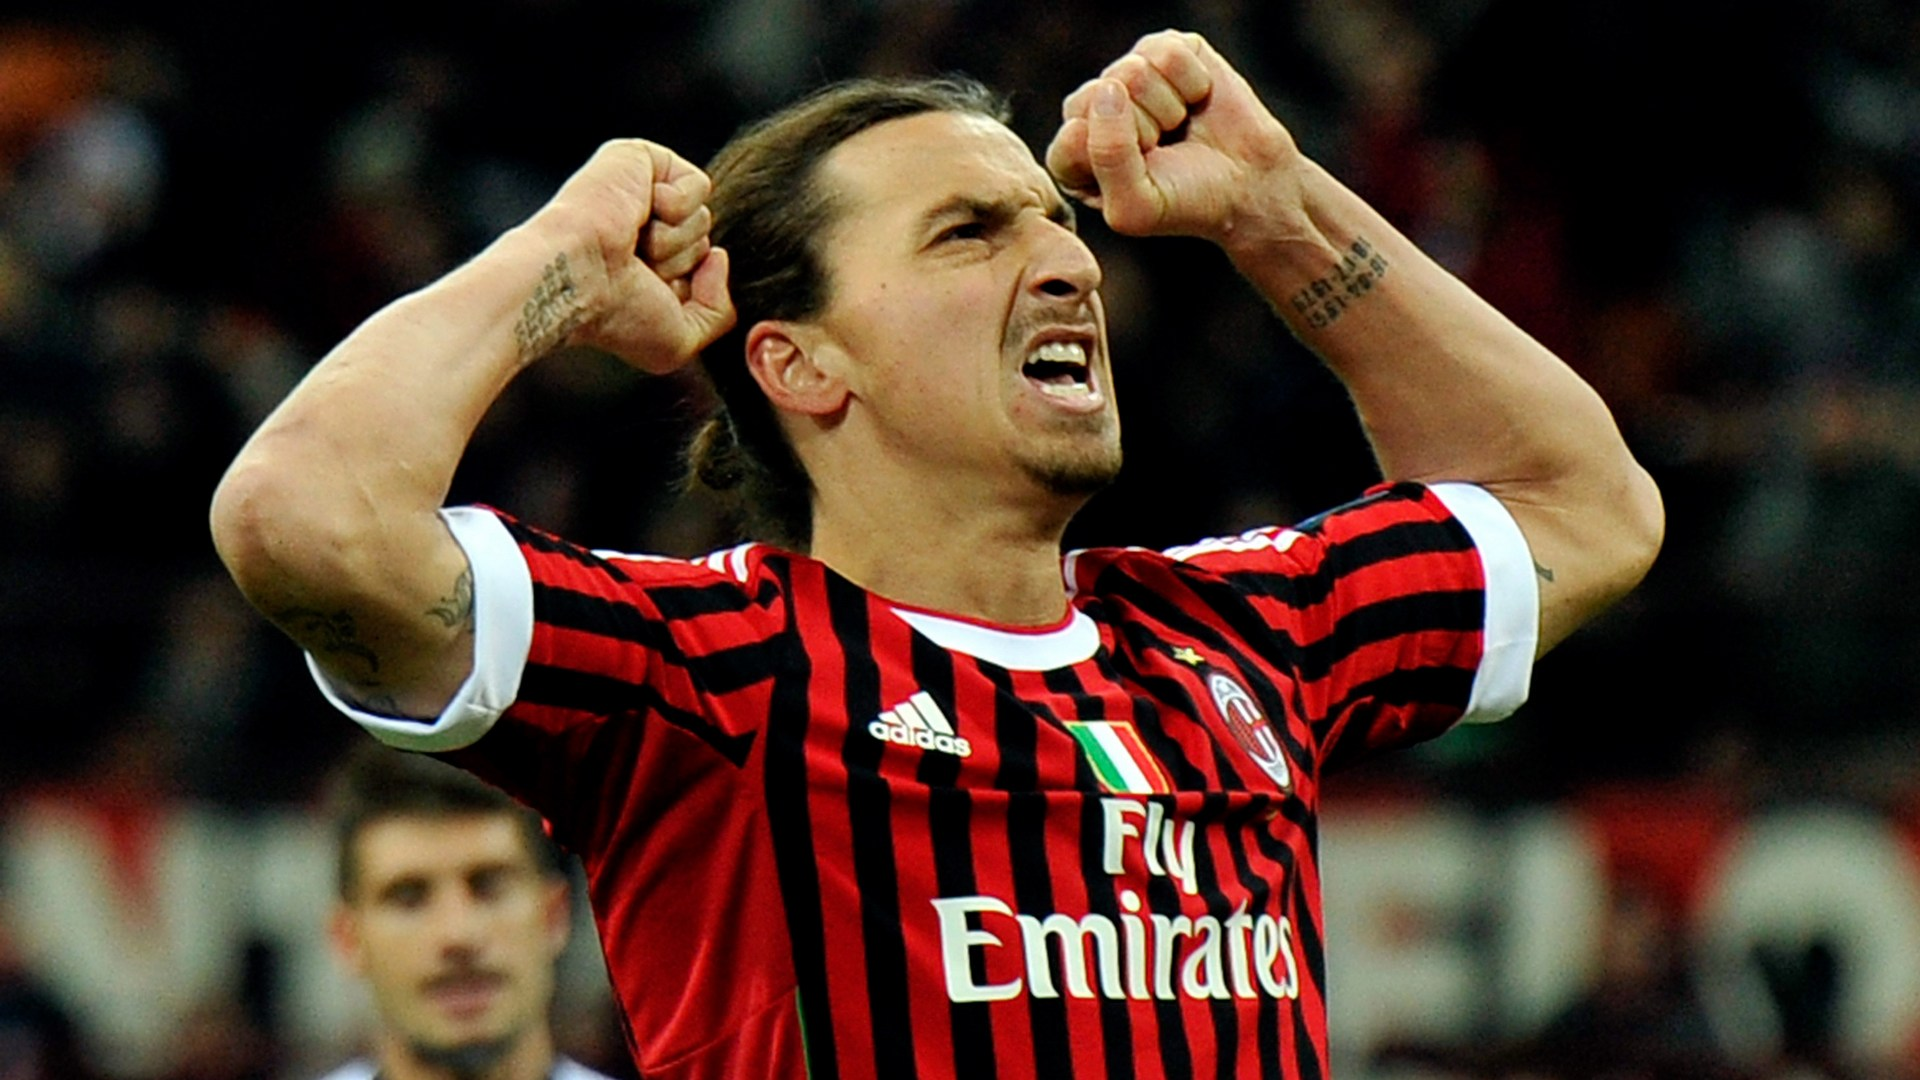 Ibrahimovic al Milan? / Calciomercato: Mourinho fa concorrenza ai rossoneri